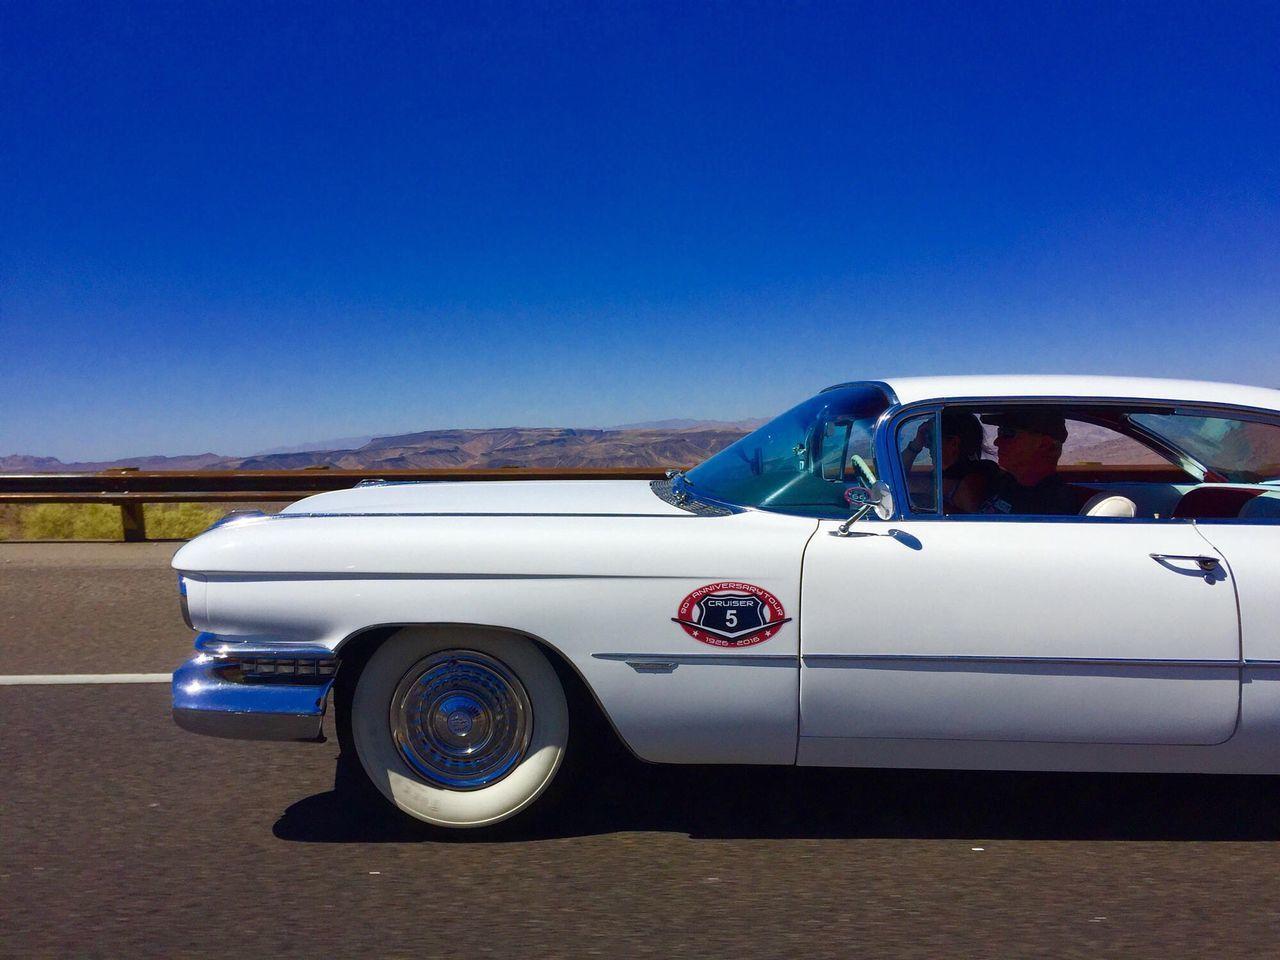 Route 66 USA Nikon Nikonphotography Nikonusa Nikonitalia Cadillac Route 66 Nevada America Travel Scattandoitalia Ontheroad